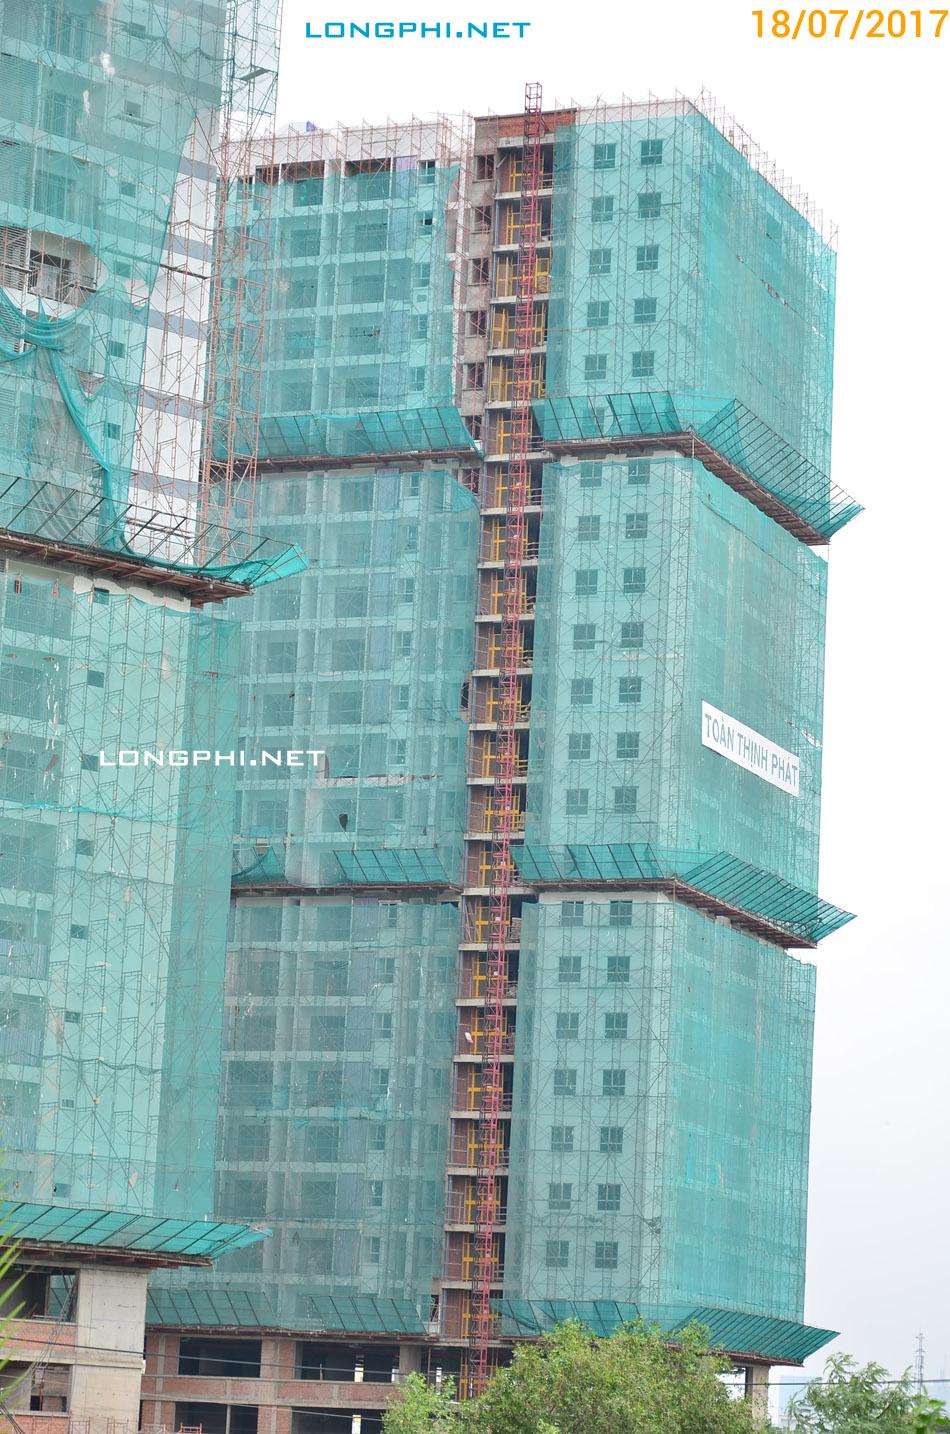 Tháp Bắc M1 - Jamona Apartment - Luxury hoem Q7 ngày 19/07/2017.